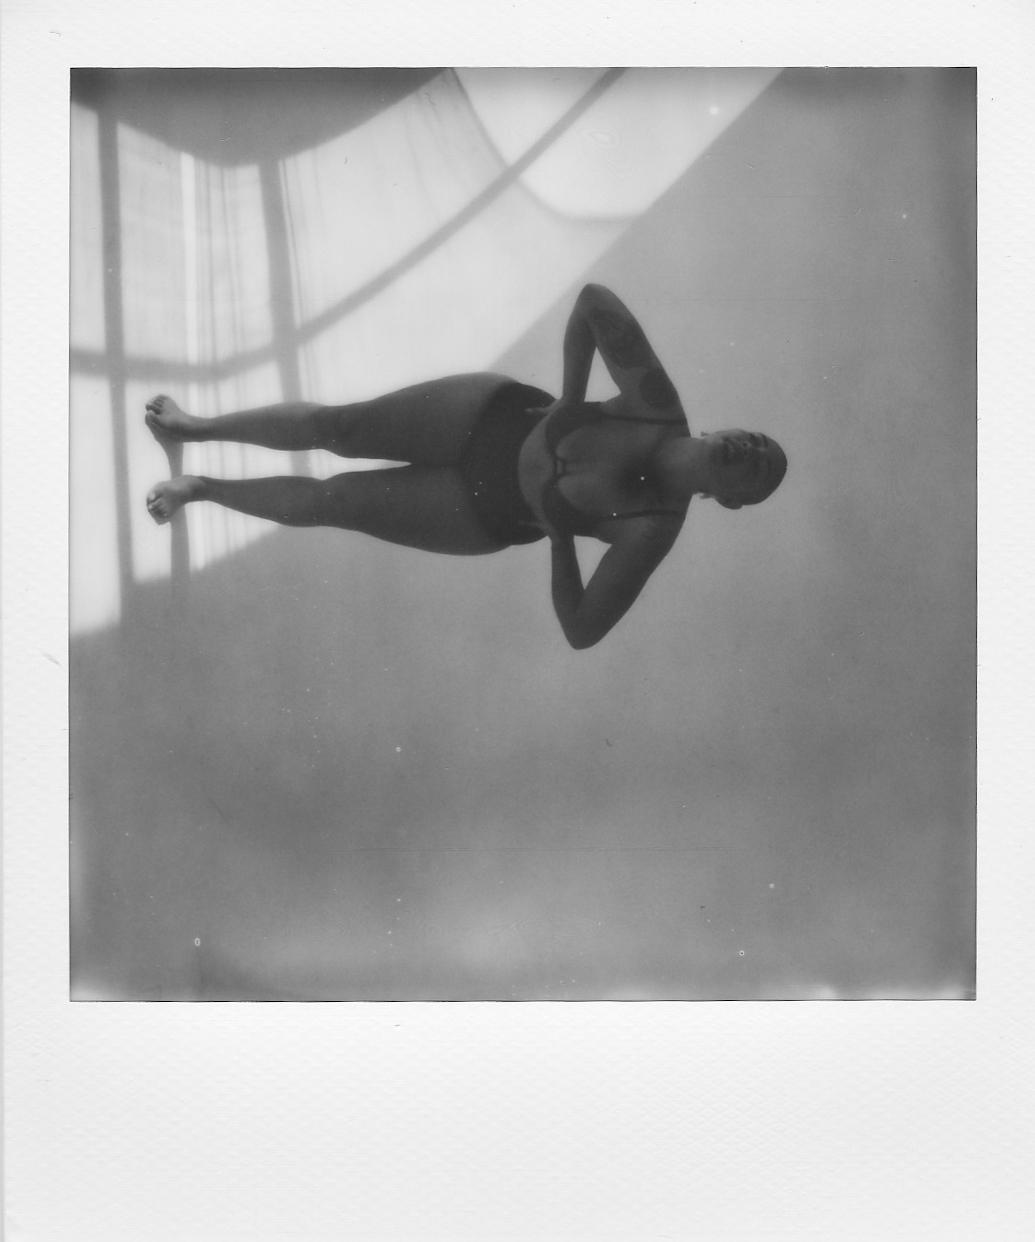 Boudoir Photographer Miami Portrait Photographer natural light studio Pam_denicelachapelle-219.jpg